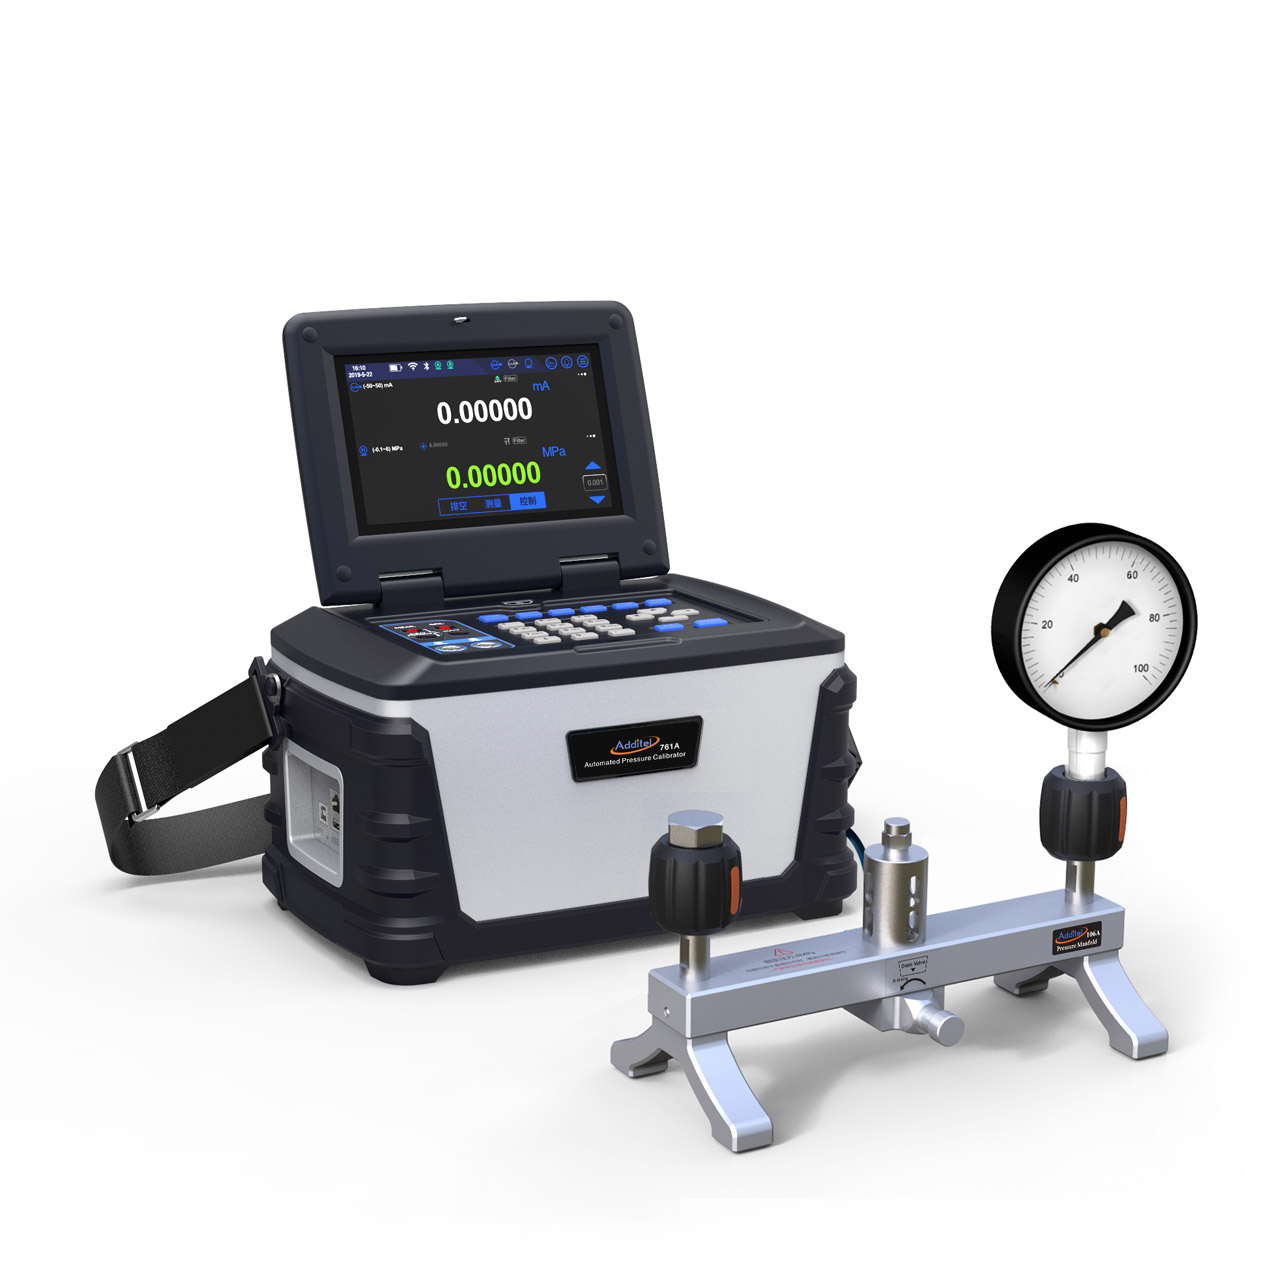 Kalibrátor ADT761A s pripojeným kalibrovaným manometrom